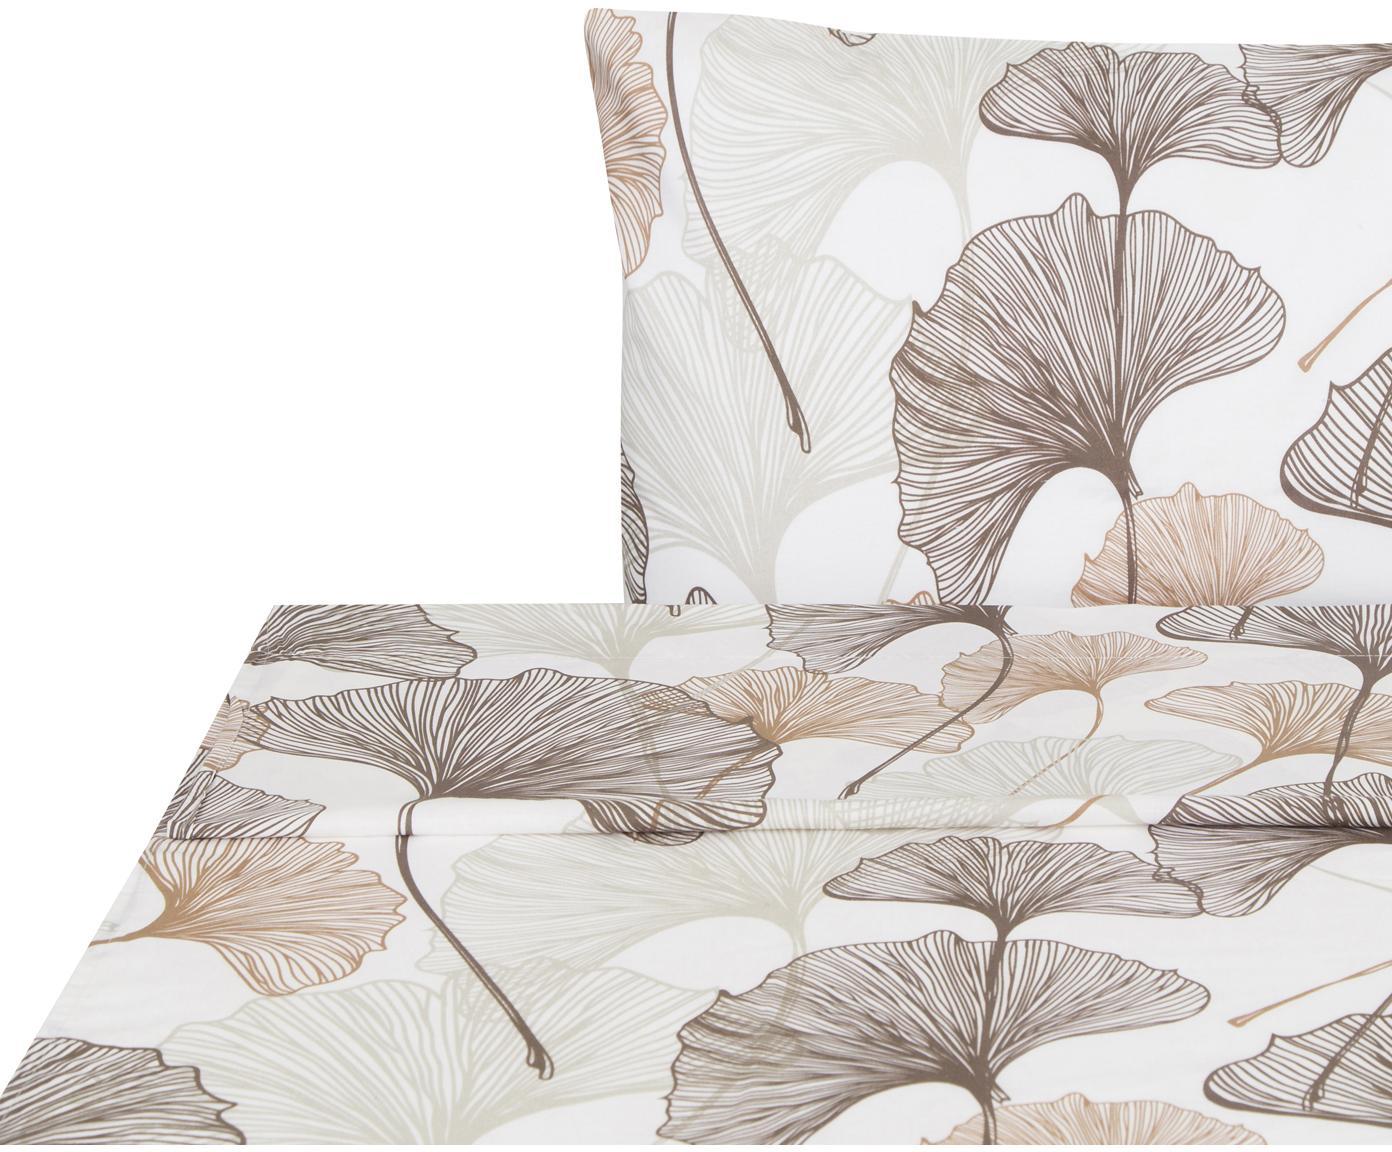 Sábana encimera Ginko, Algodón, Blanco, gris pardo, tonos beige, Cama 90 cm (160 x 270 cm)